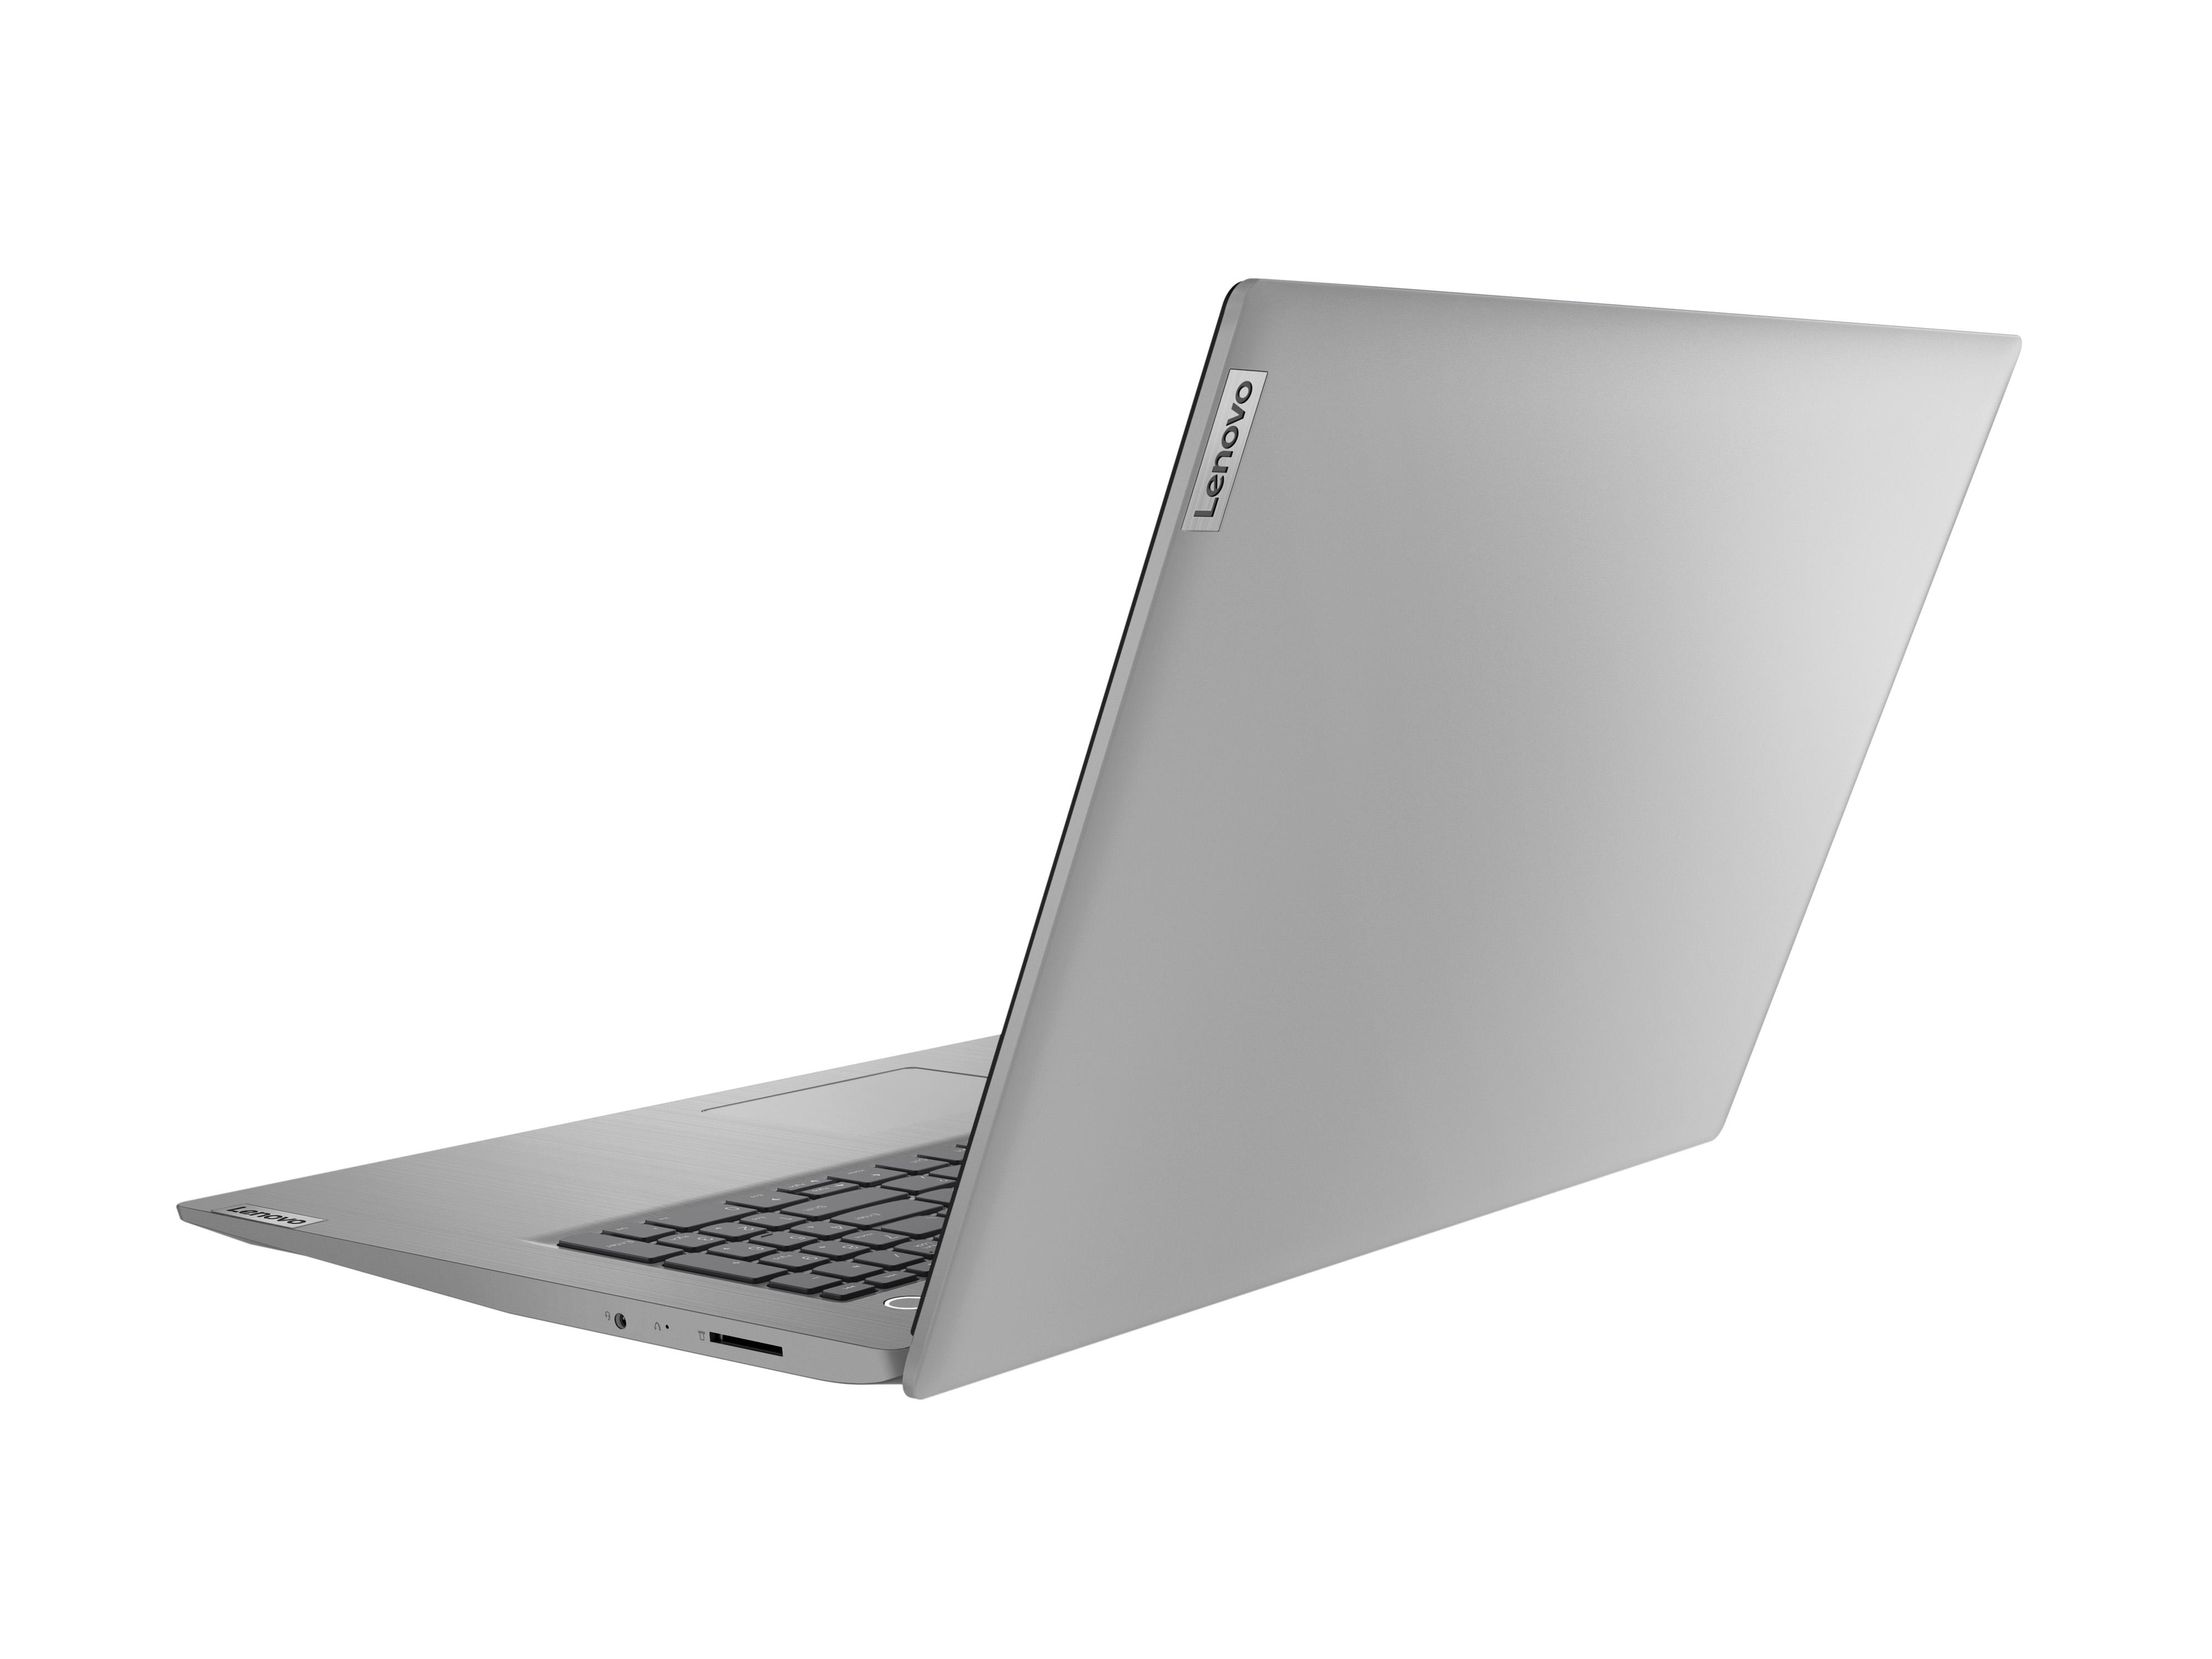 Фото  Ноутбук Lenovo ideapad 3i 17IML05 Platinum Grey (81WC003CRE)